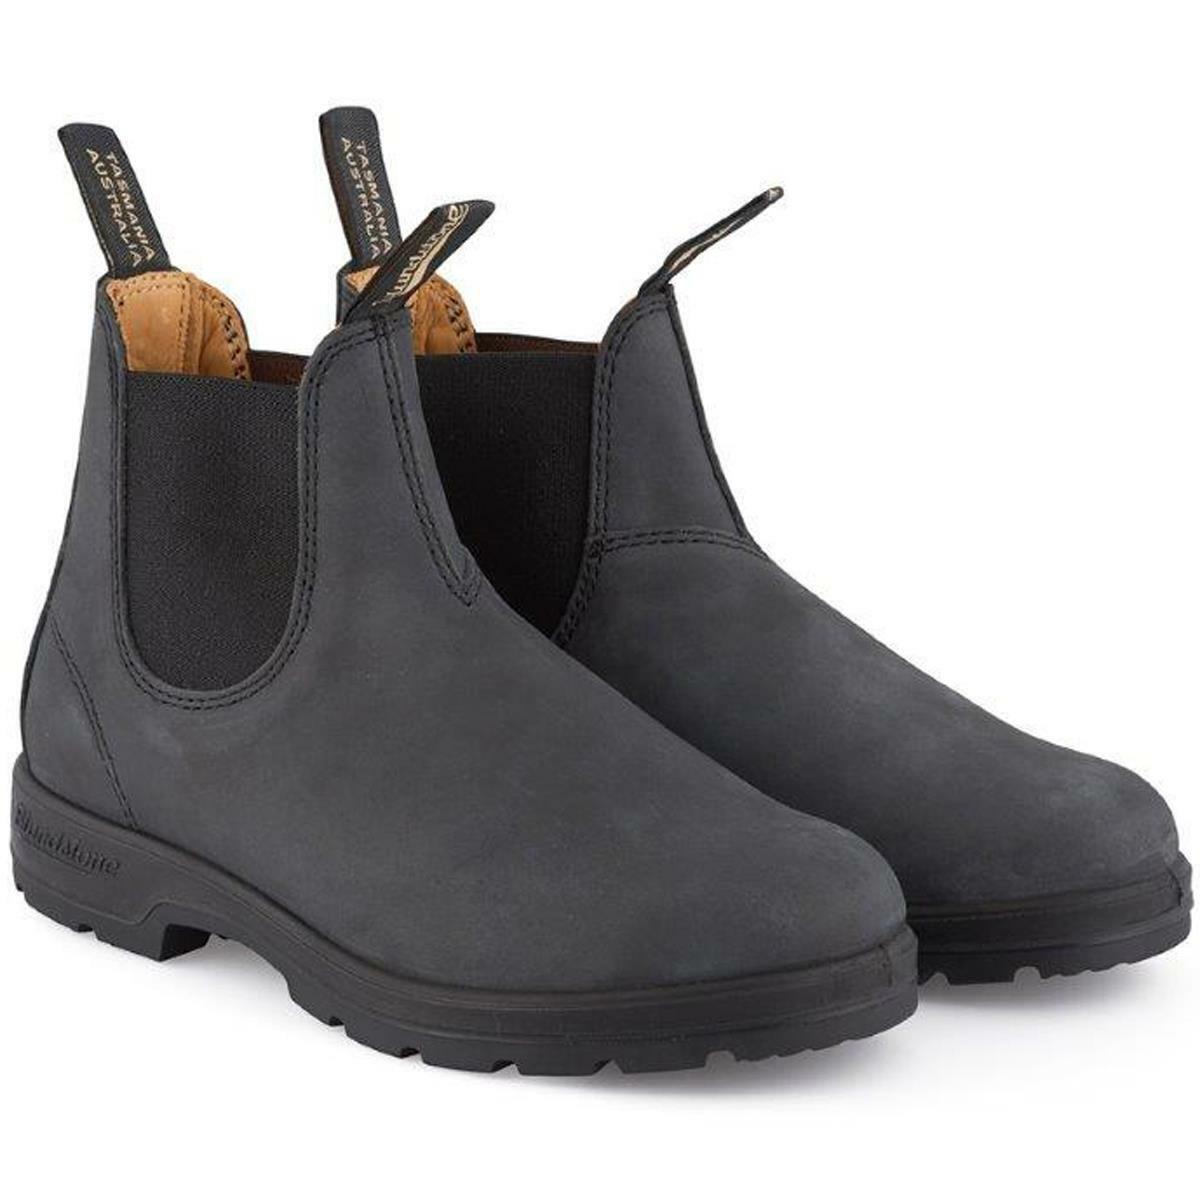 Blundstone Mens Ladies Classics 587 Chelsea Boot Black Shoes Footwear